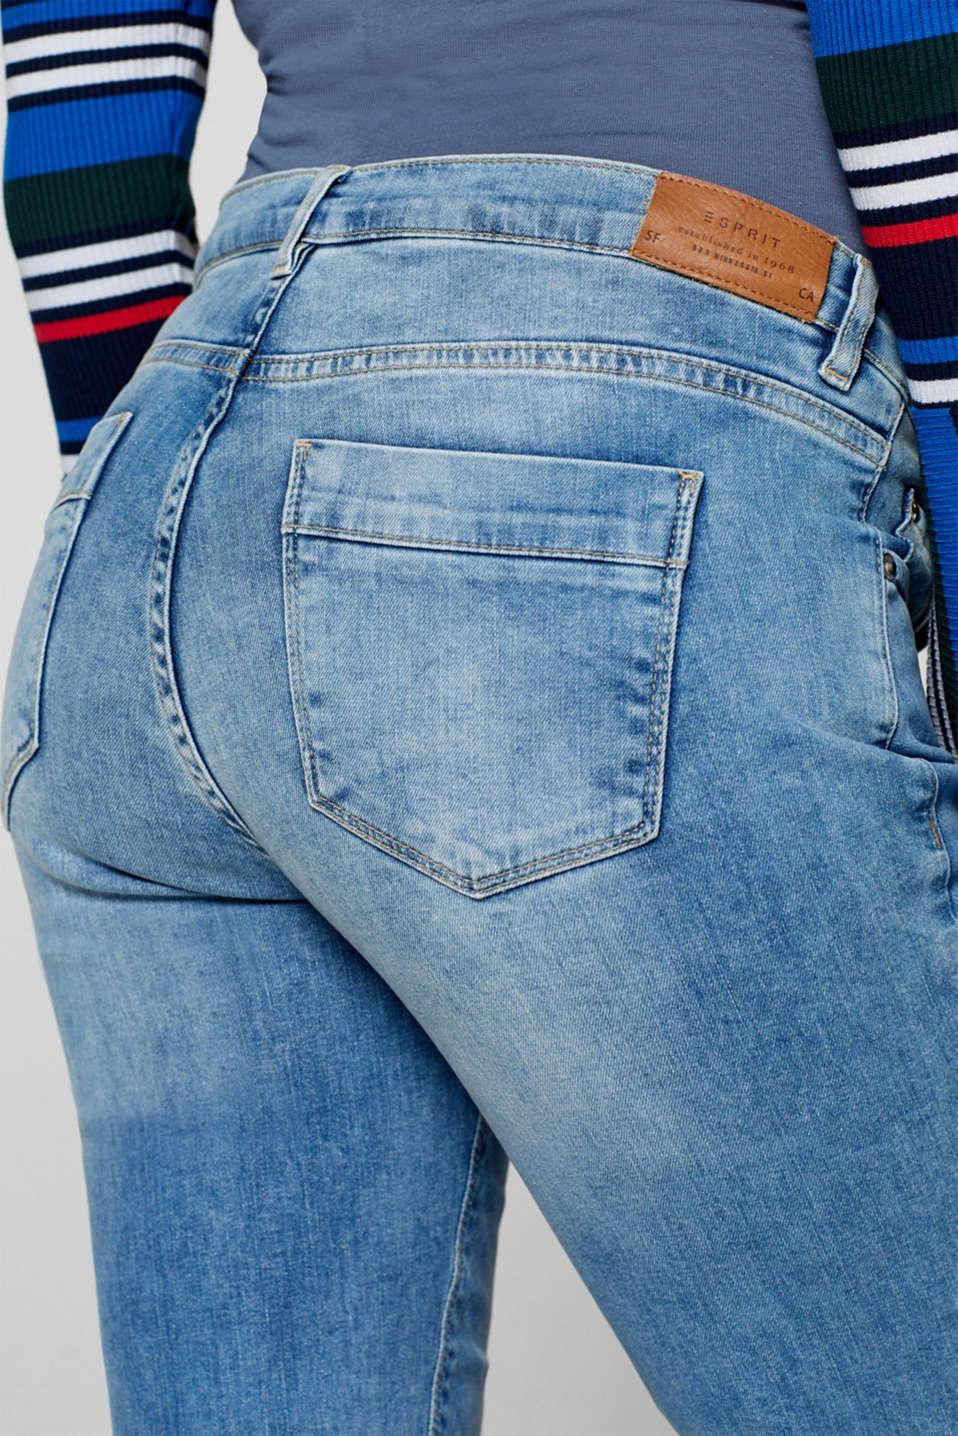 Pants denim, LCLIGHTWASH, detail image number 6